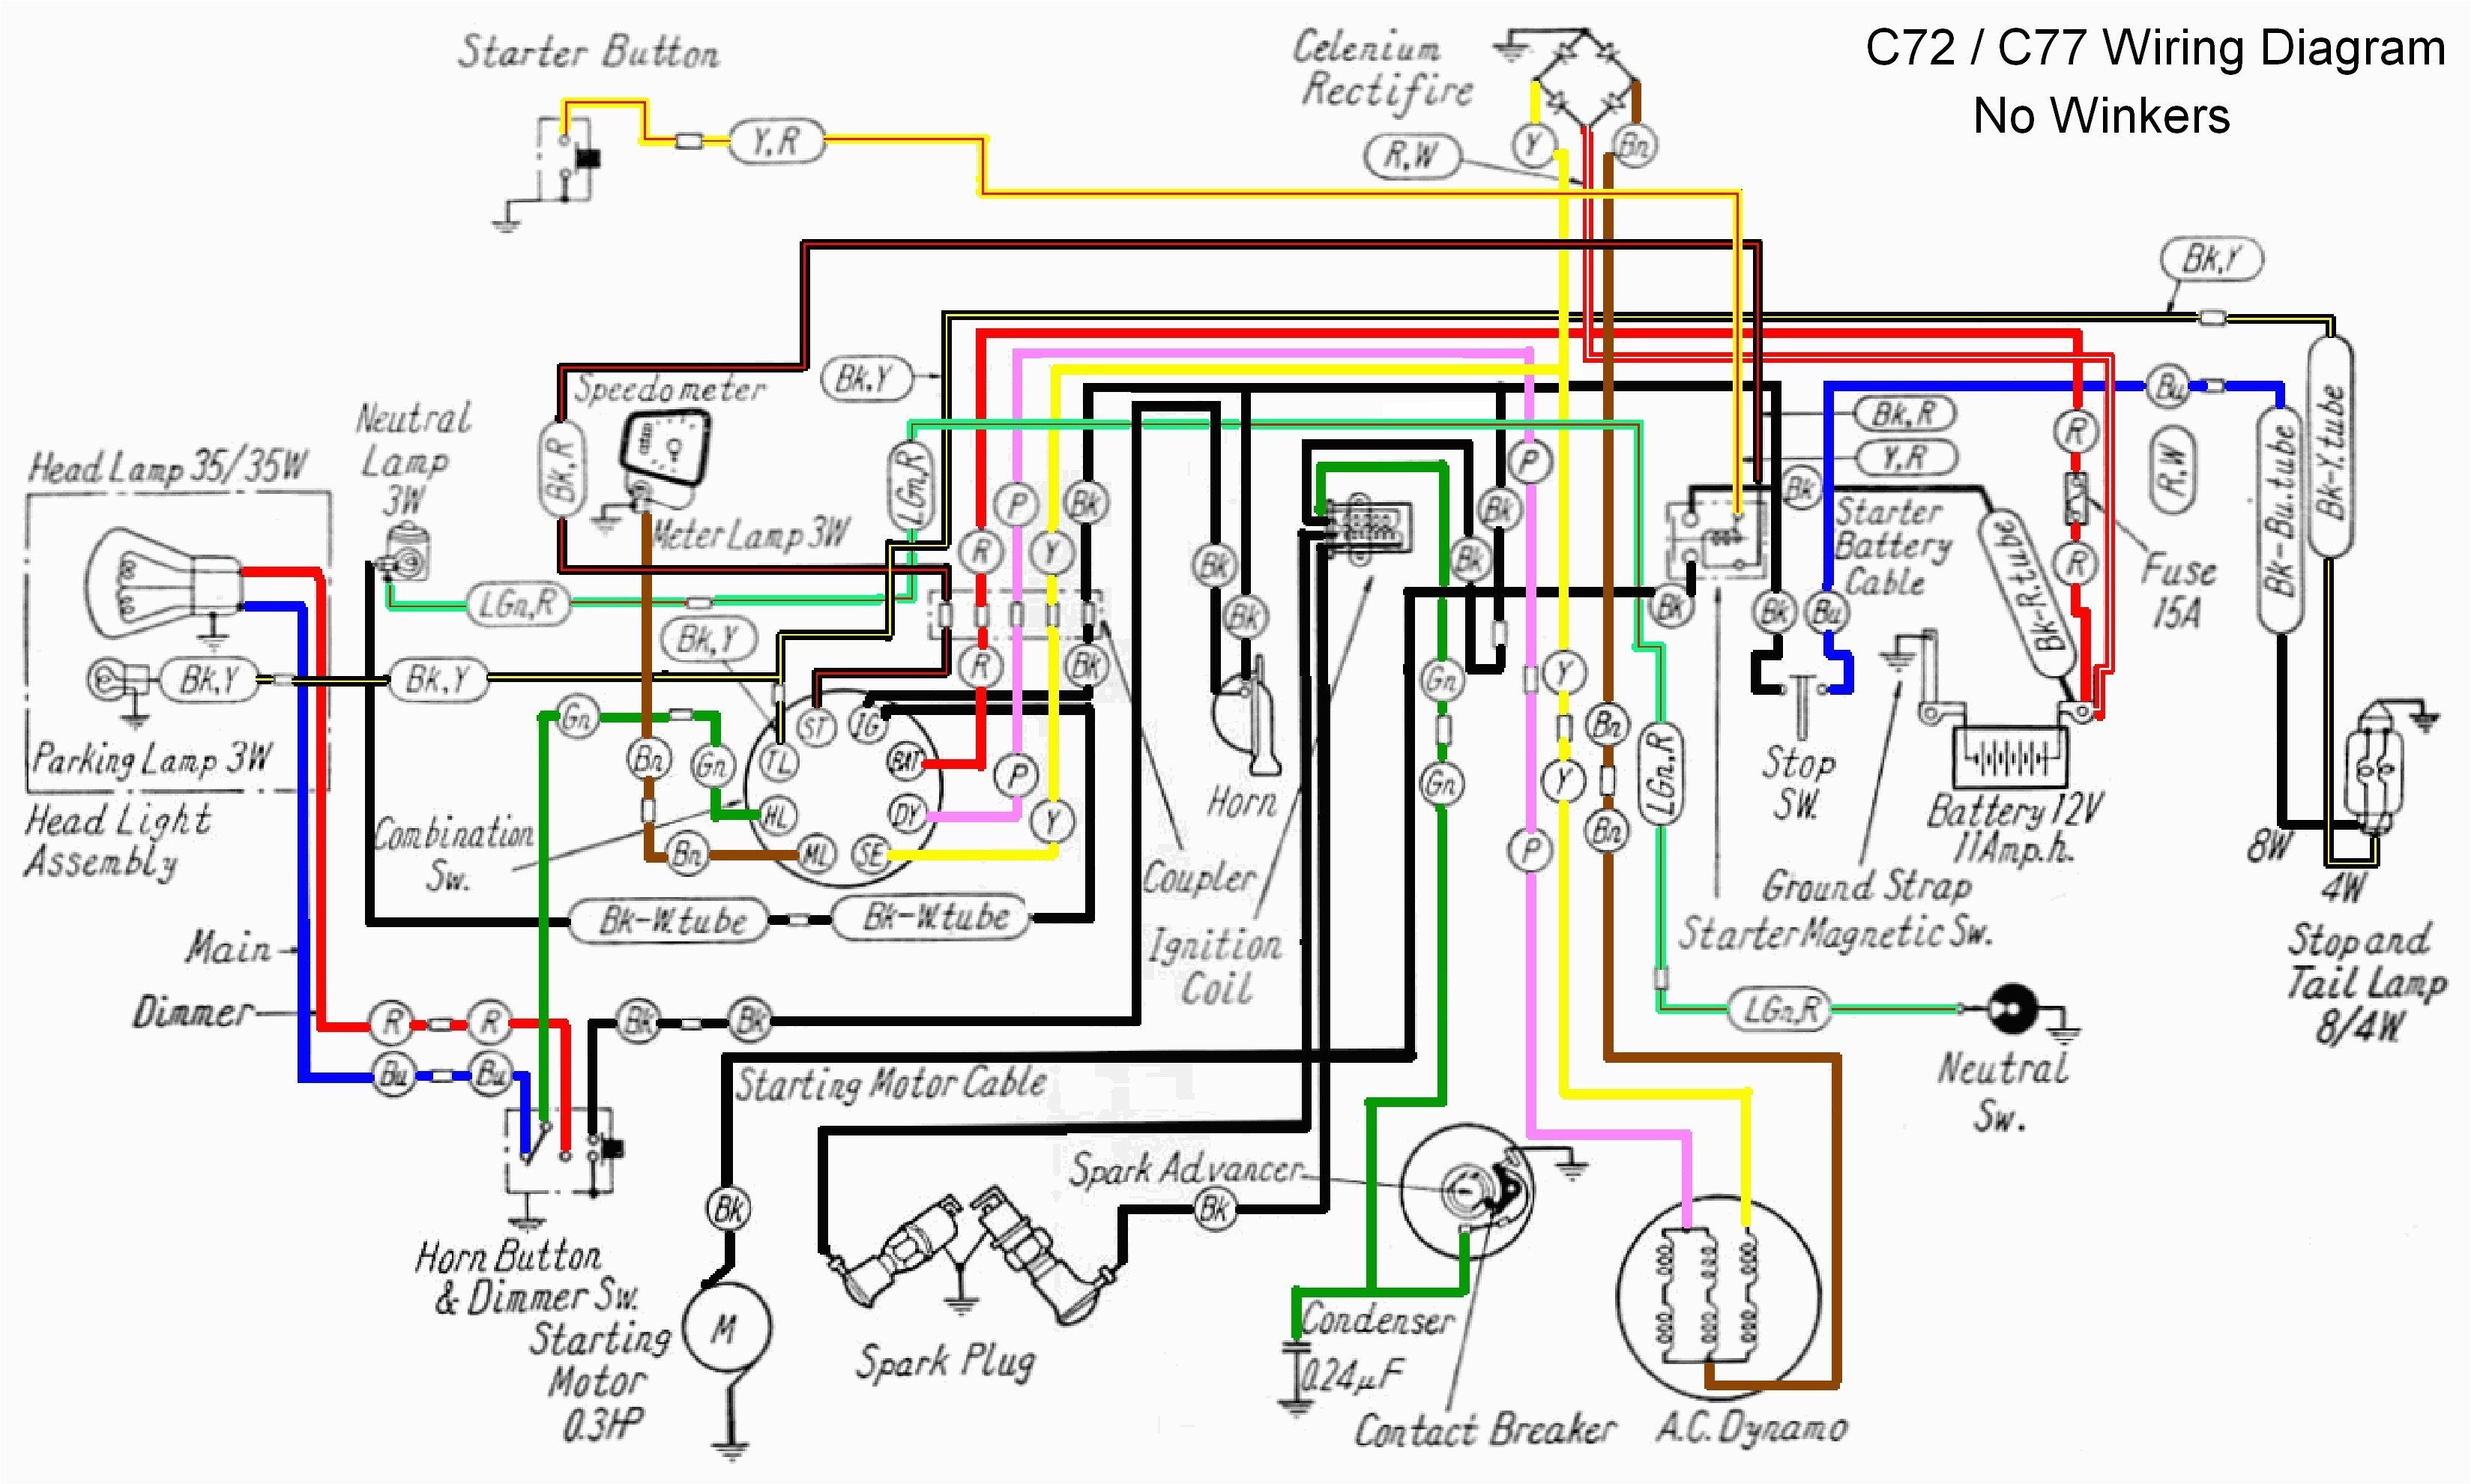 xl125 wiring diagram wiring diagram toolbox honda xlr 125 r wiring diagram honda xl 125 wiring diagram